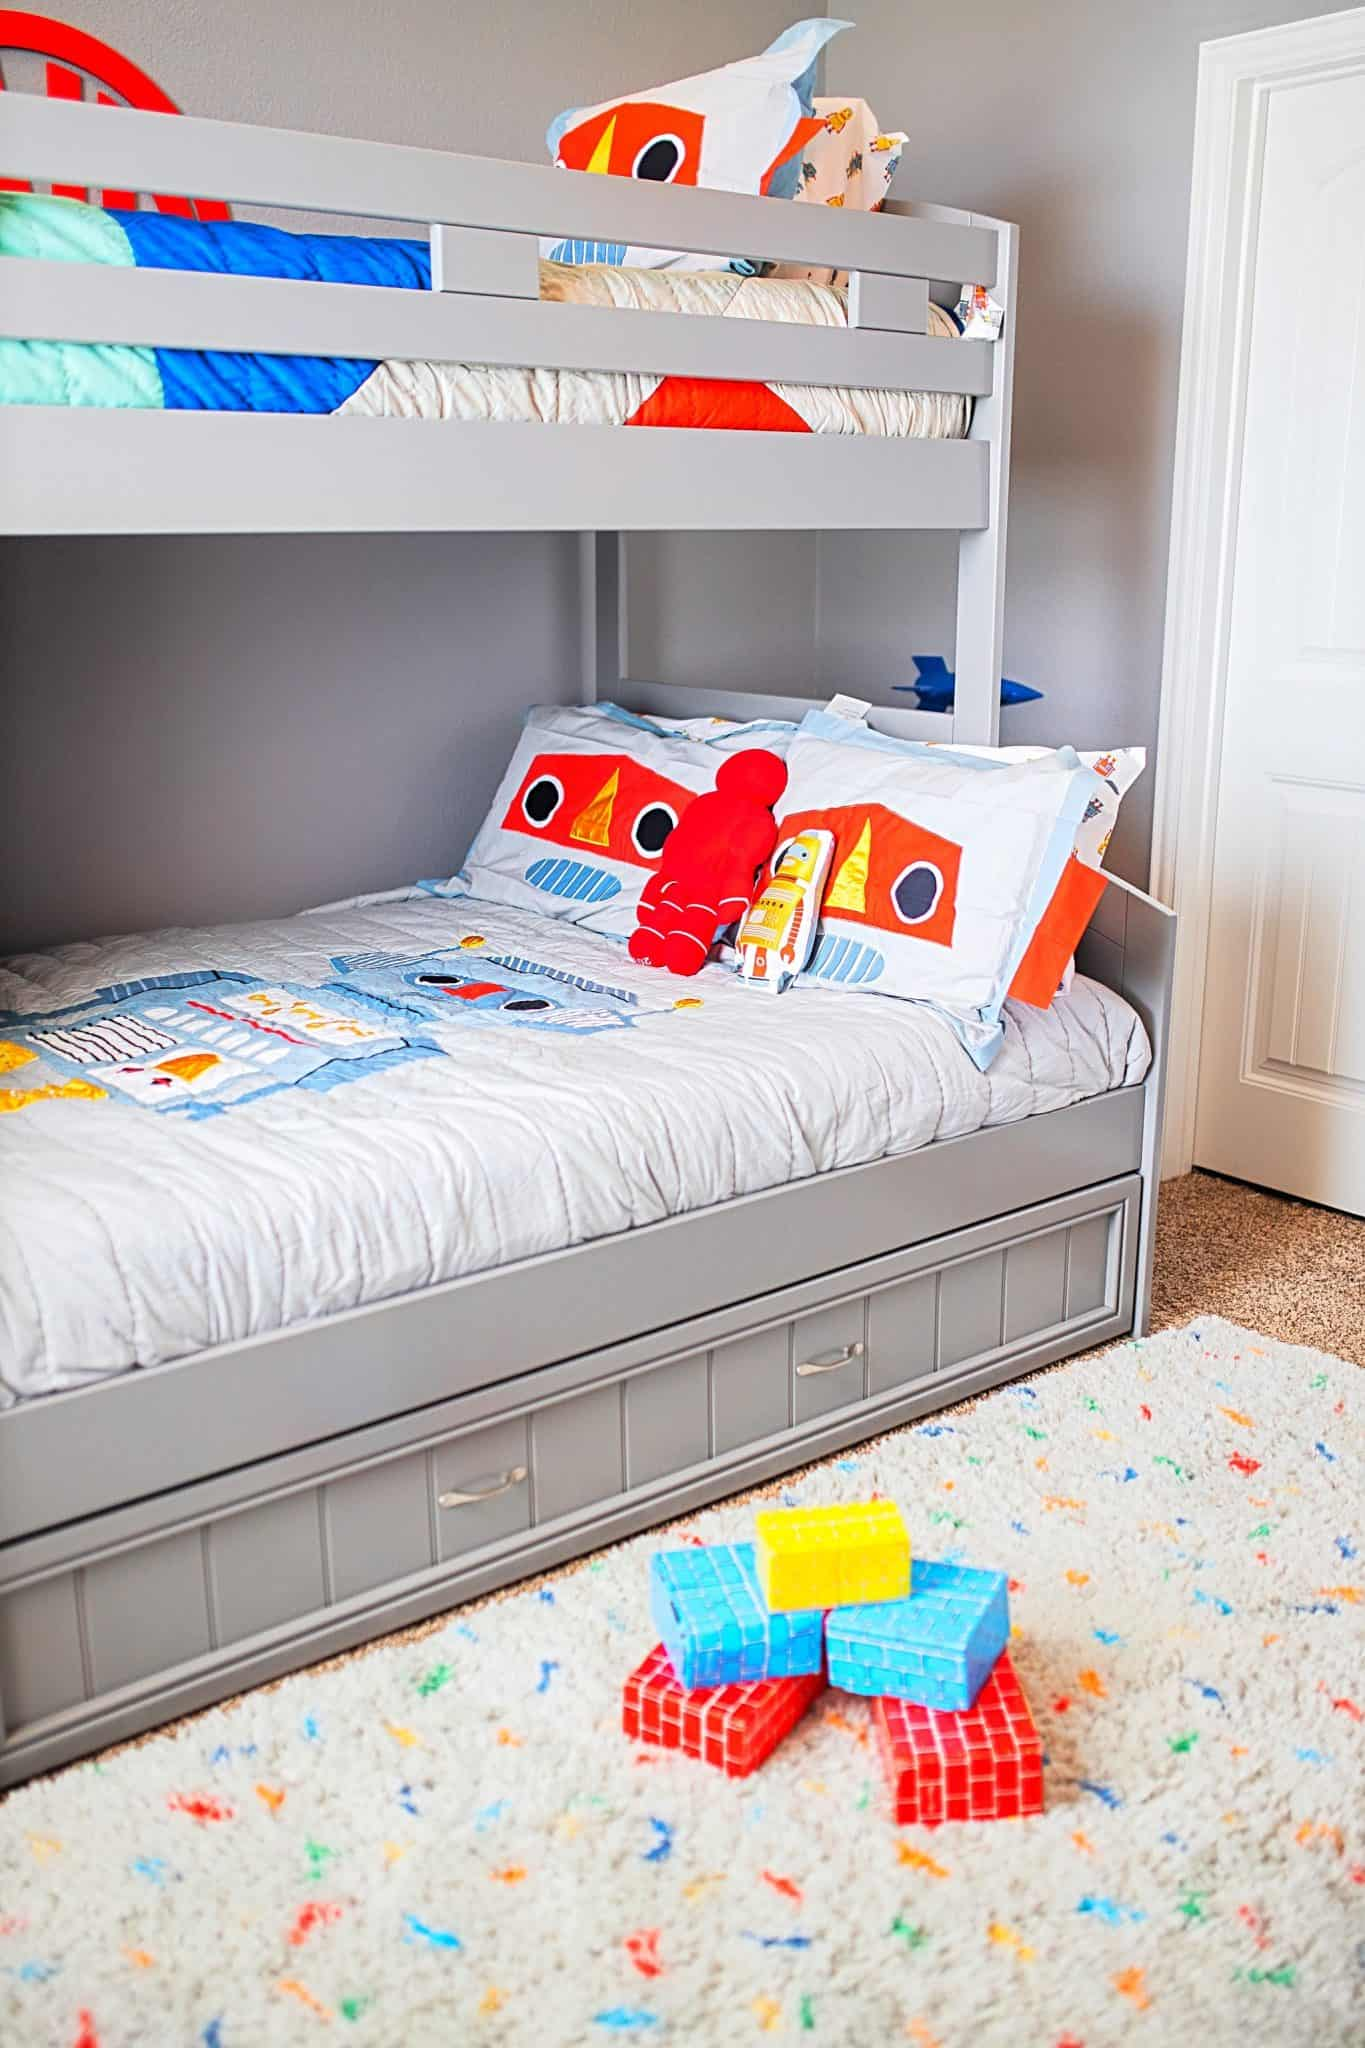 Boys Bunk Bed Room Ideas: Robot Theme | Glamorous Versatility